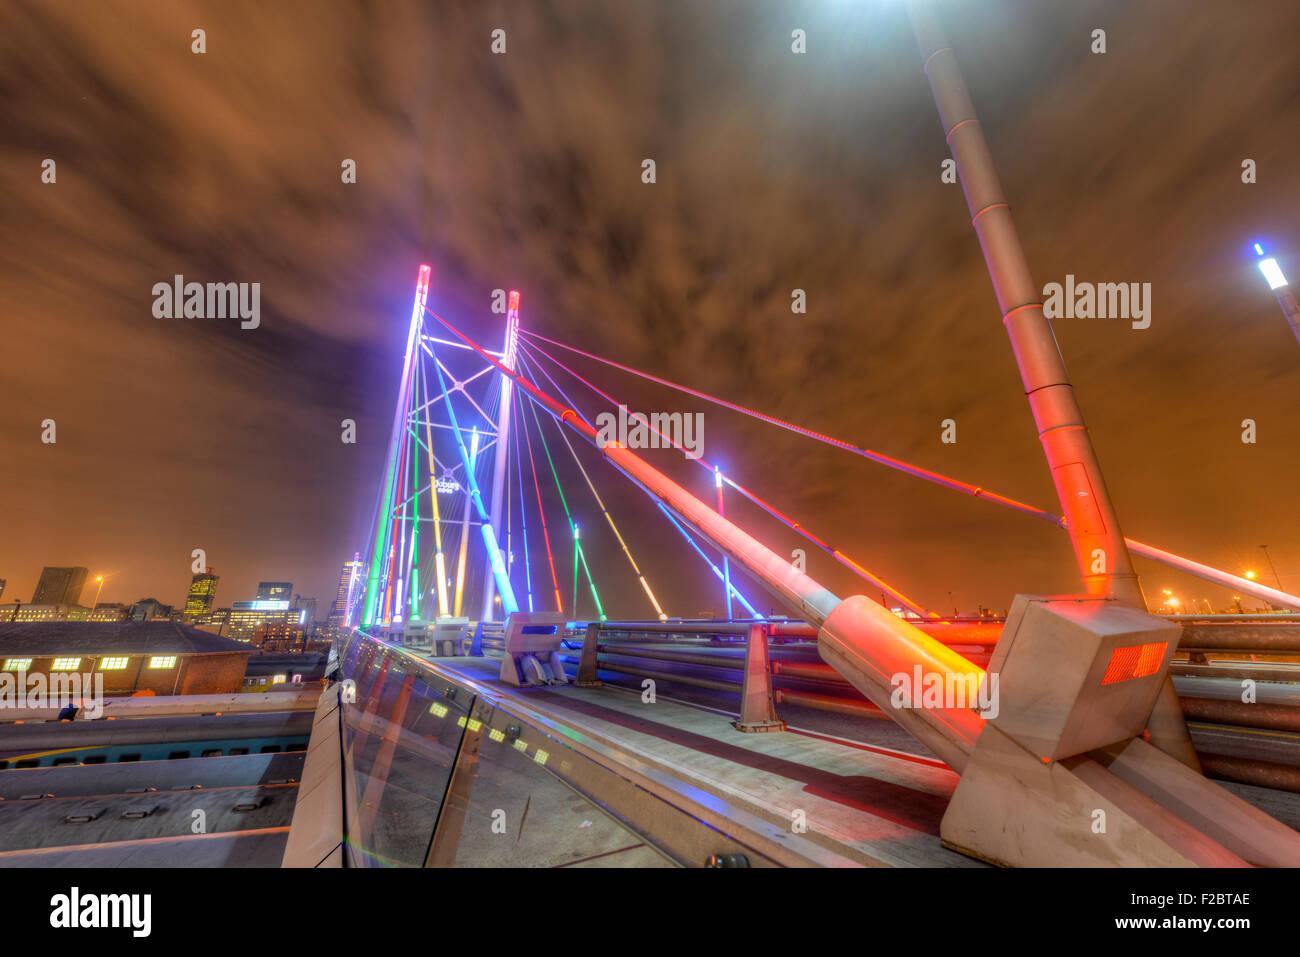 Nelson Mandela Bridge at night. The 284 metre long Nelson Mandela Bridge, starts at the end of Jan Smuts Avenue - Stock Image